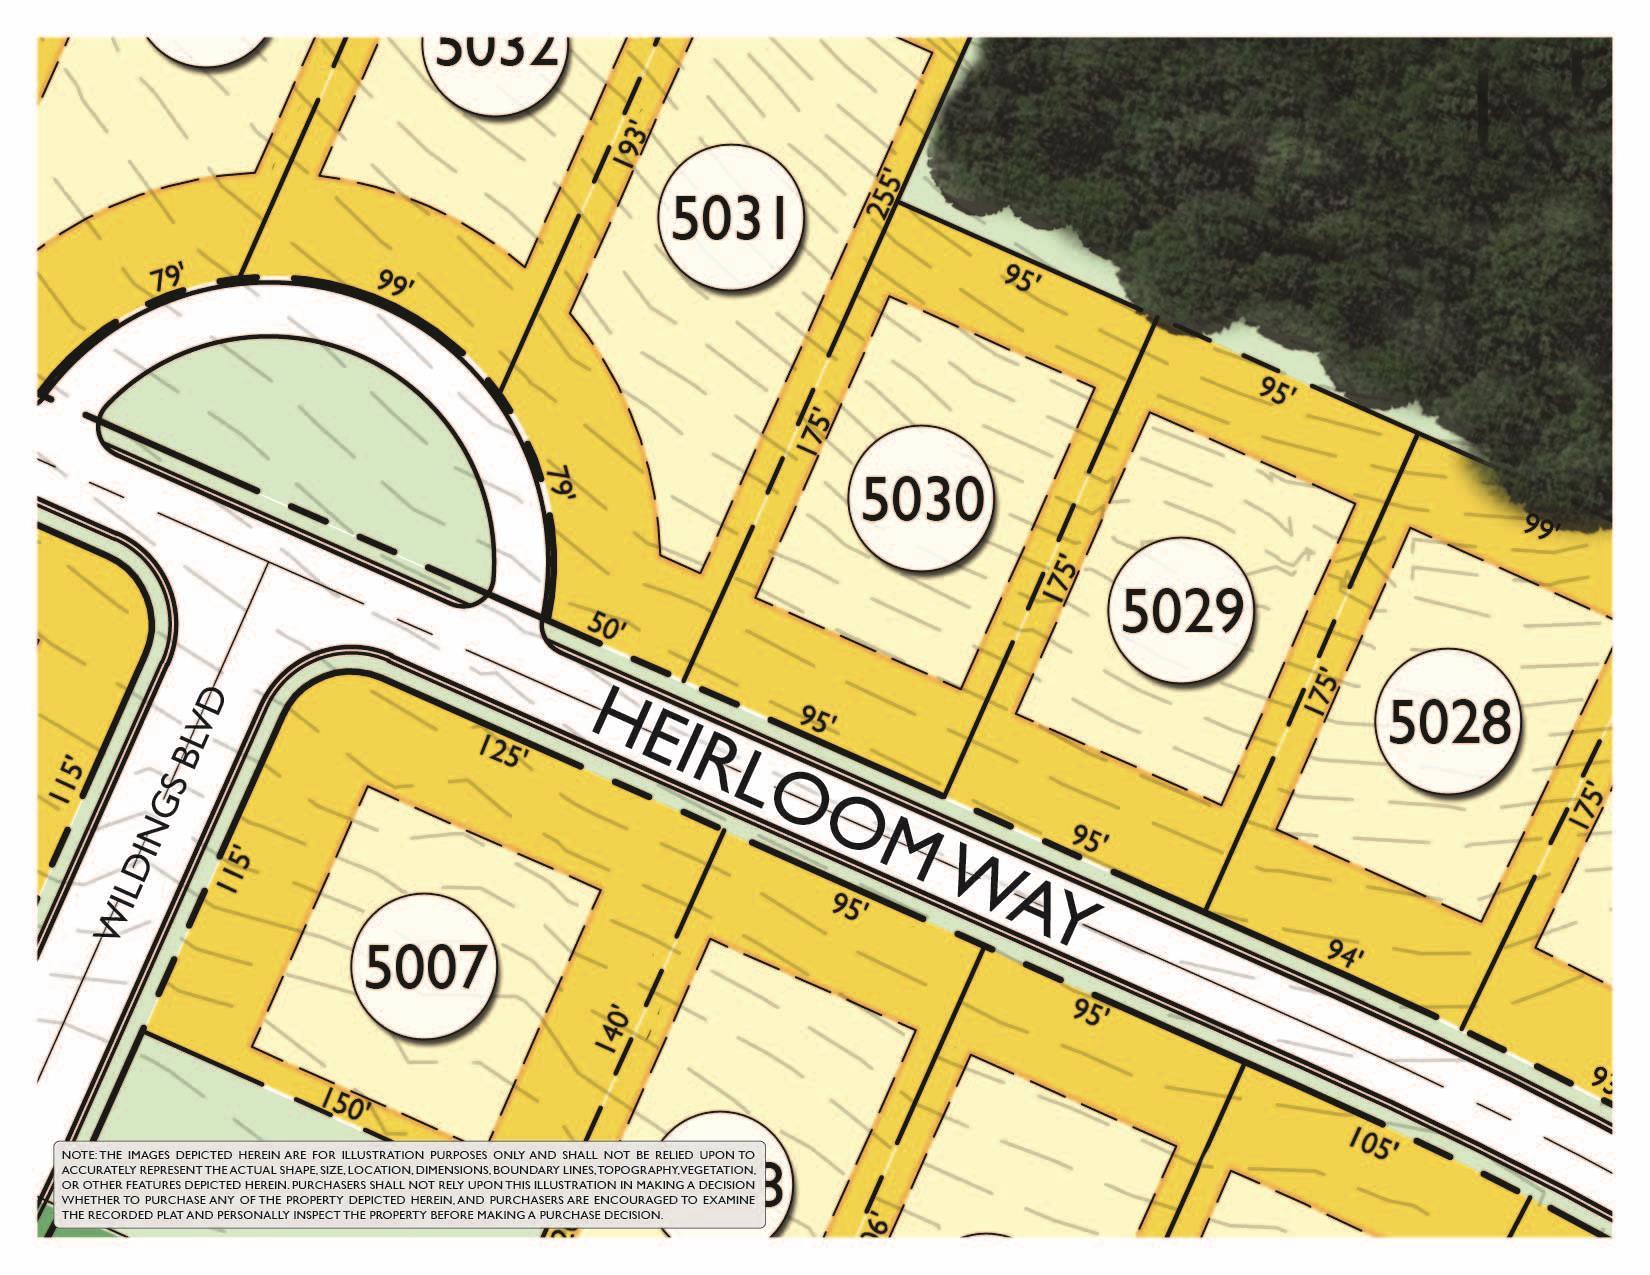 8227 Heirloom Blvd (Lot 5030), College Grove, TN 37046 - College Grove, TN real estate listing